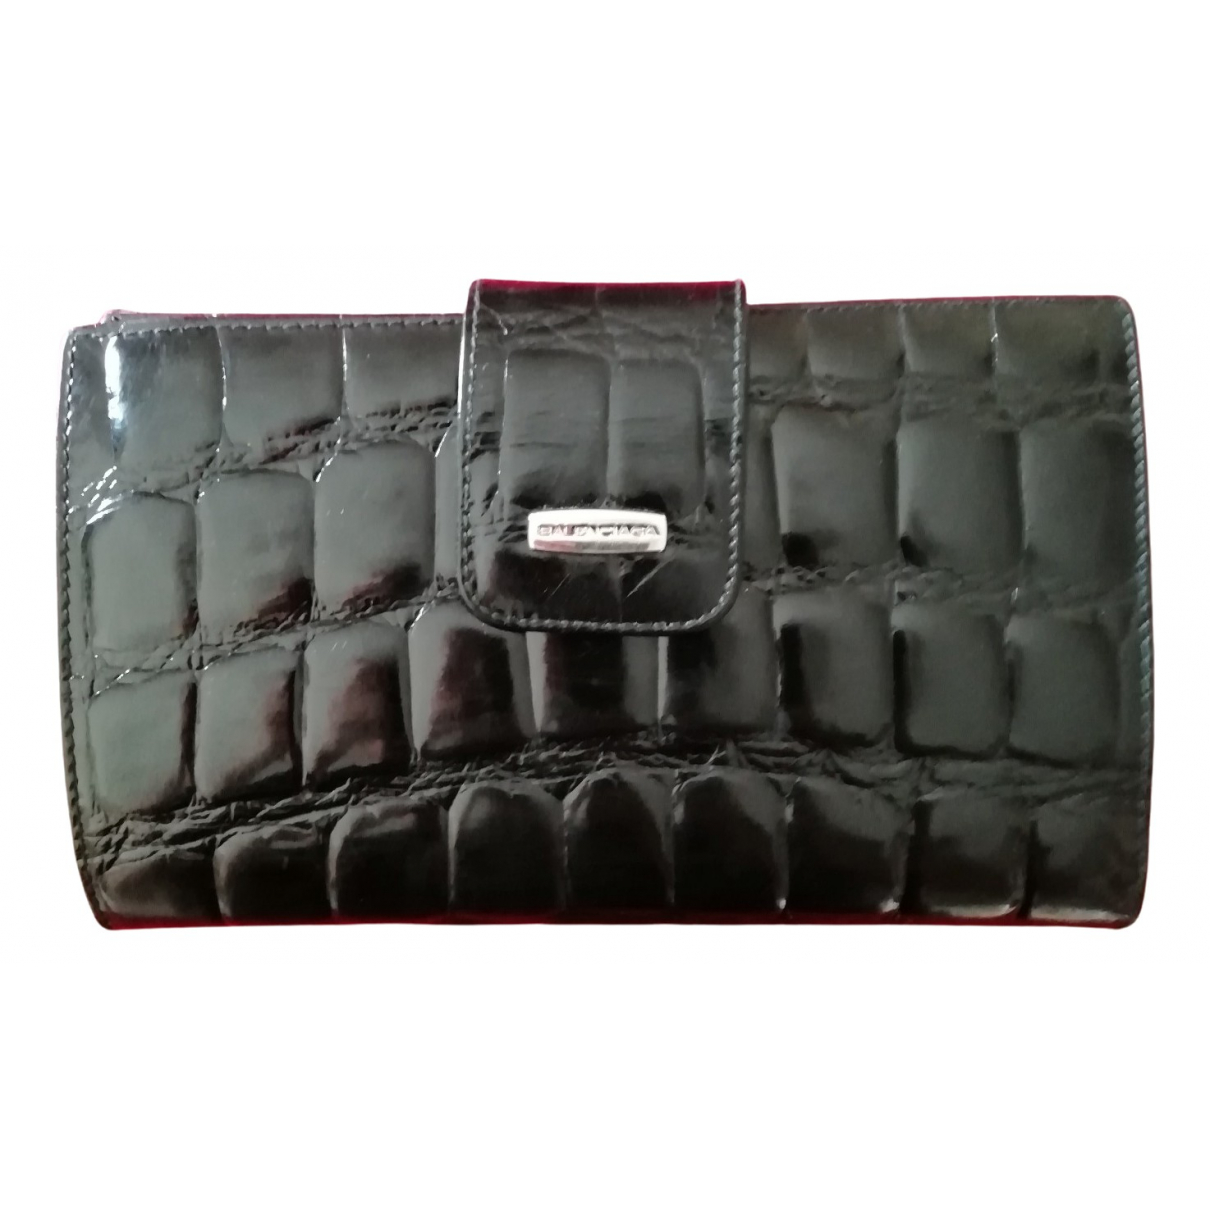 Balenciaga - Portefeuille   pour femme en cuir verni - noir